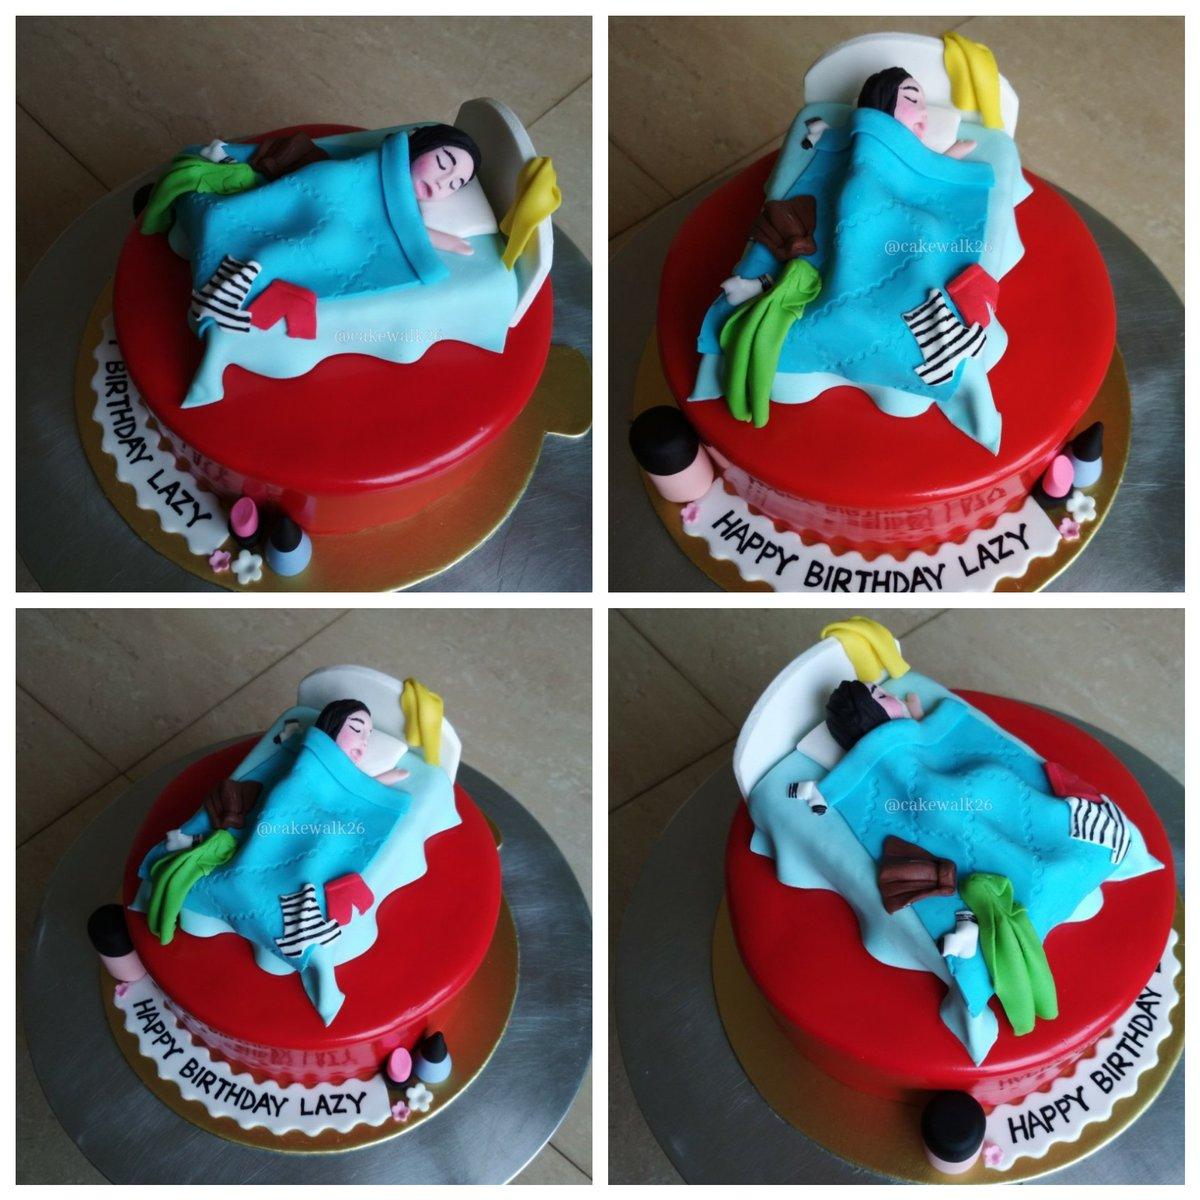 Messyroom SleepingBeauty Girls Bedroom Birthdaycakes Cake Birthdaygirl Cakedecorating Sugarcraft Satinice Fondant Fondantart Foodpics